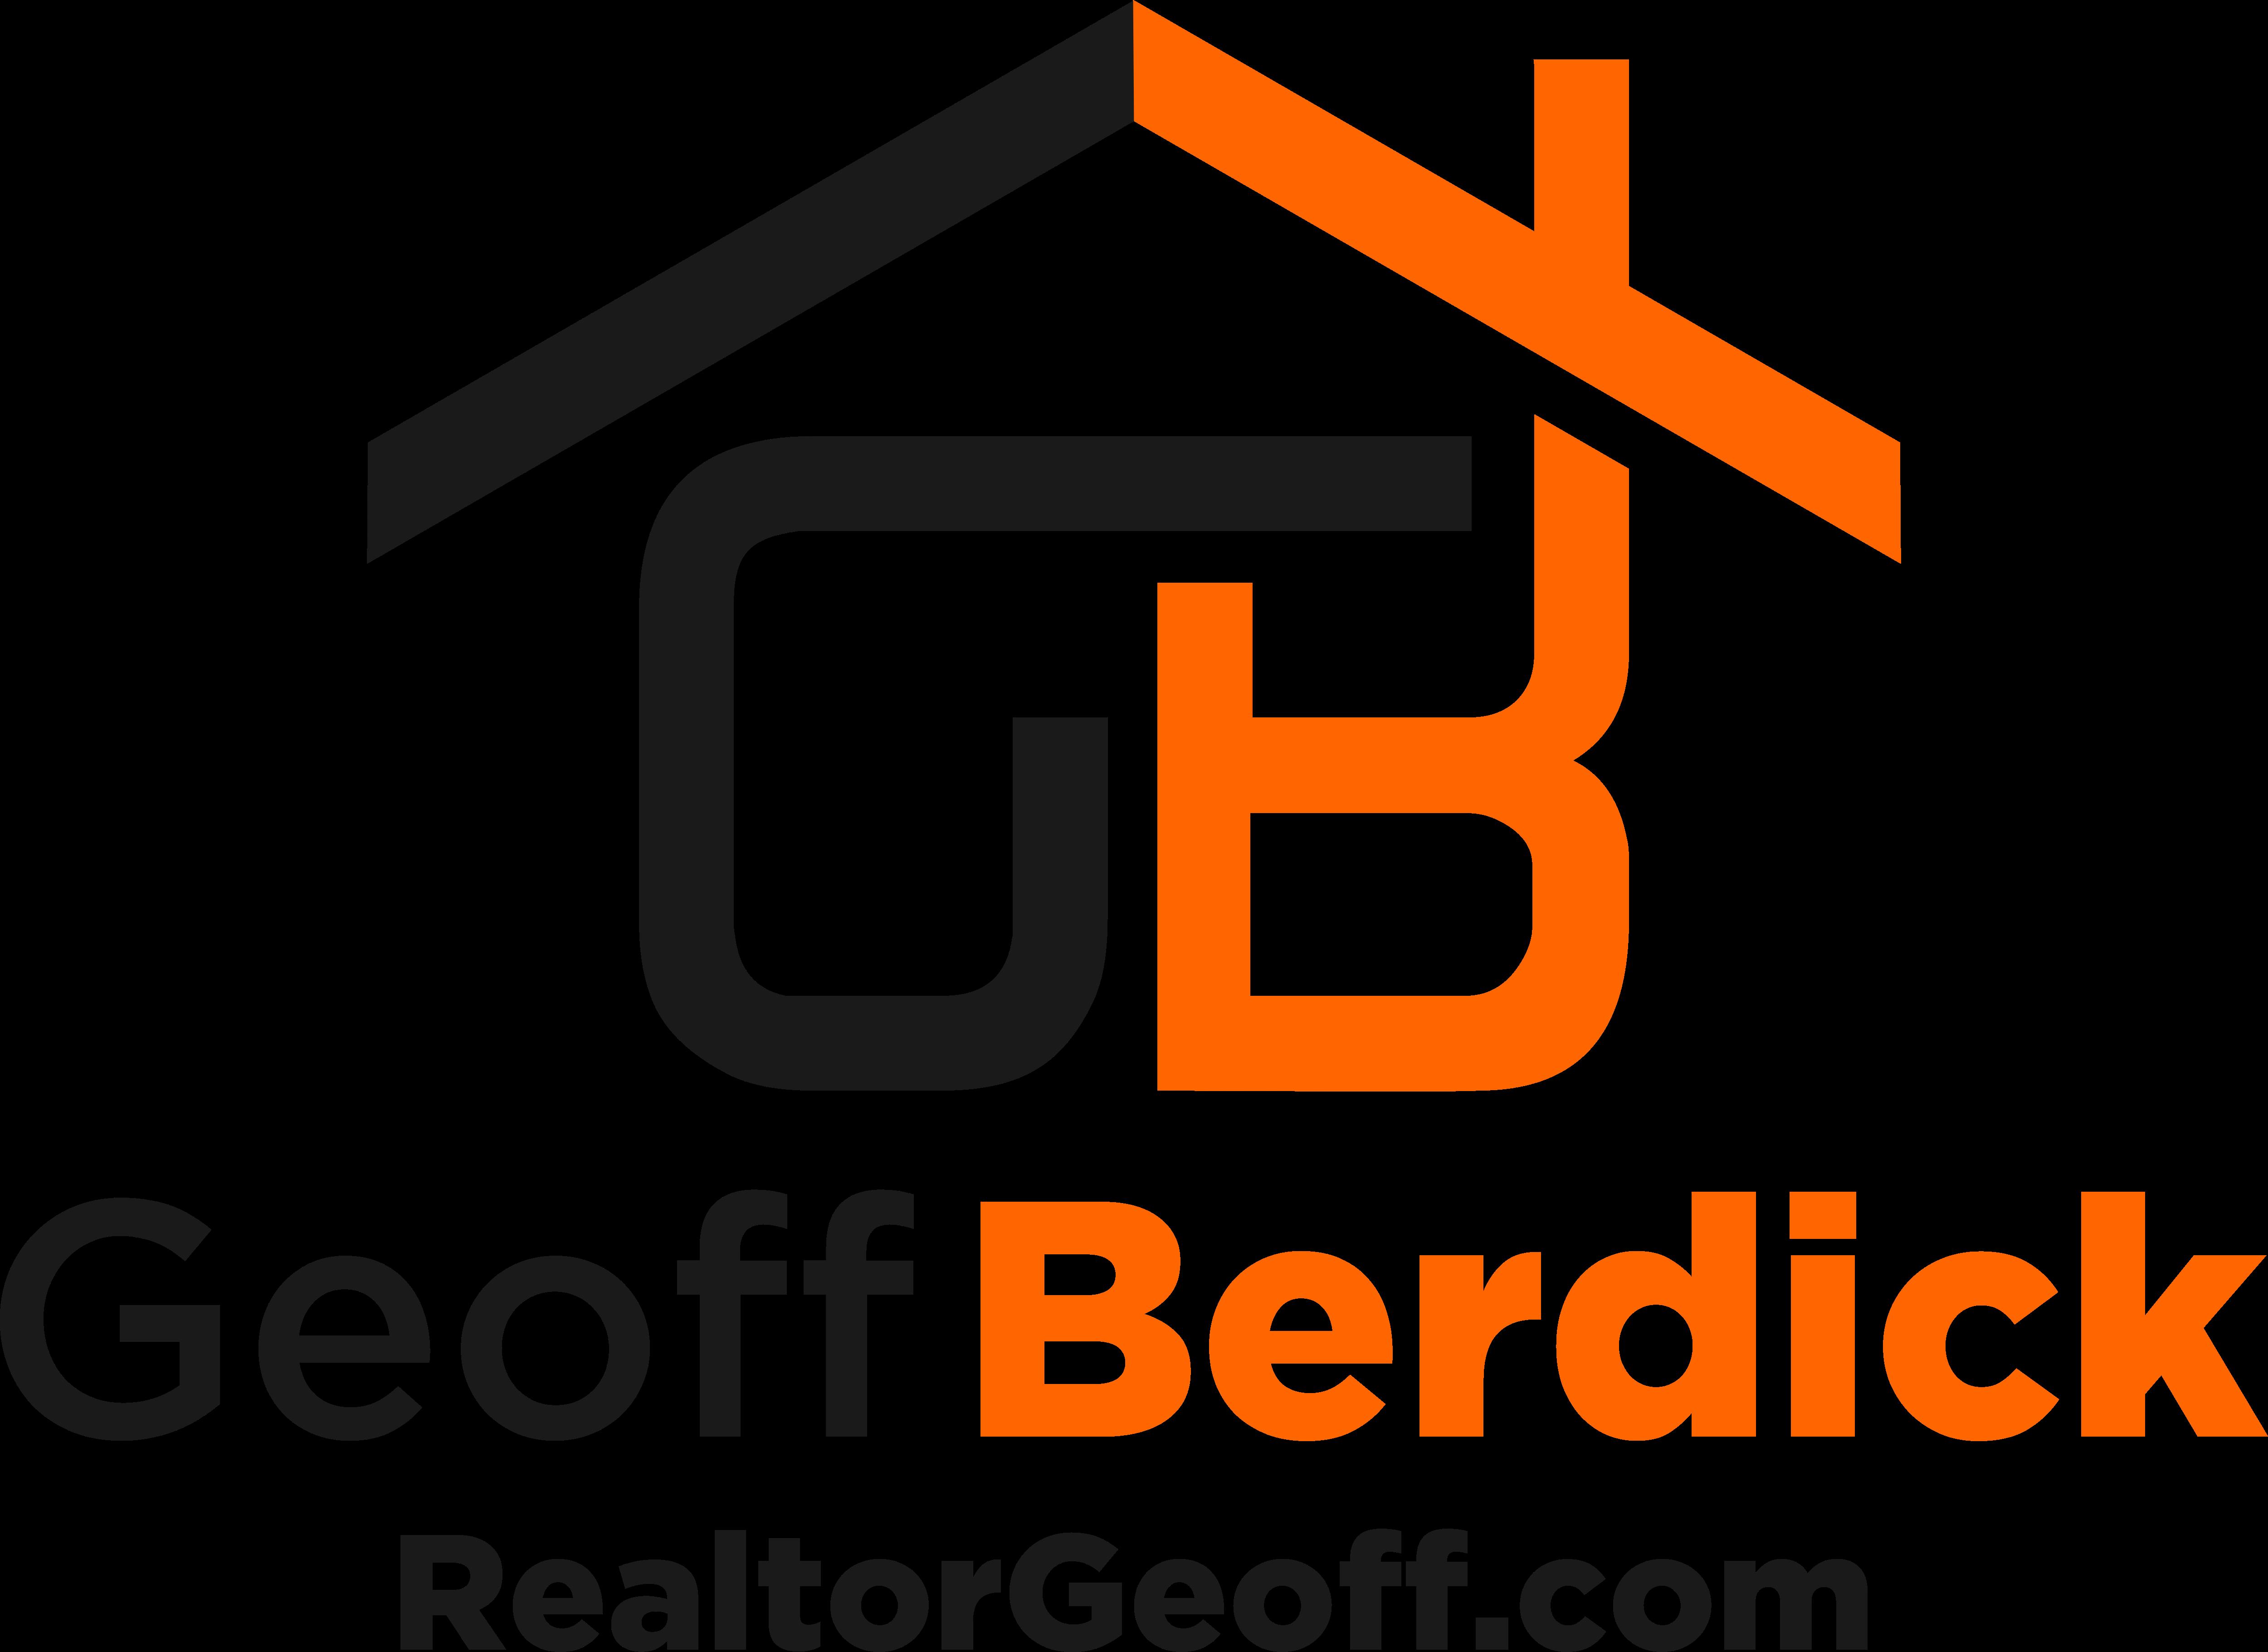 Geoff Berdick